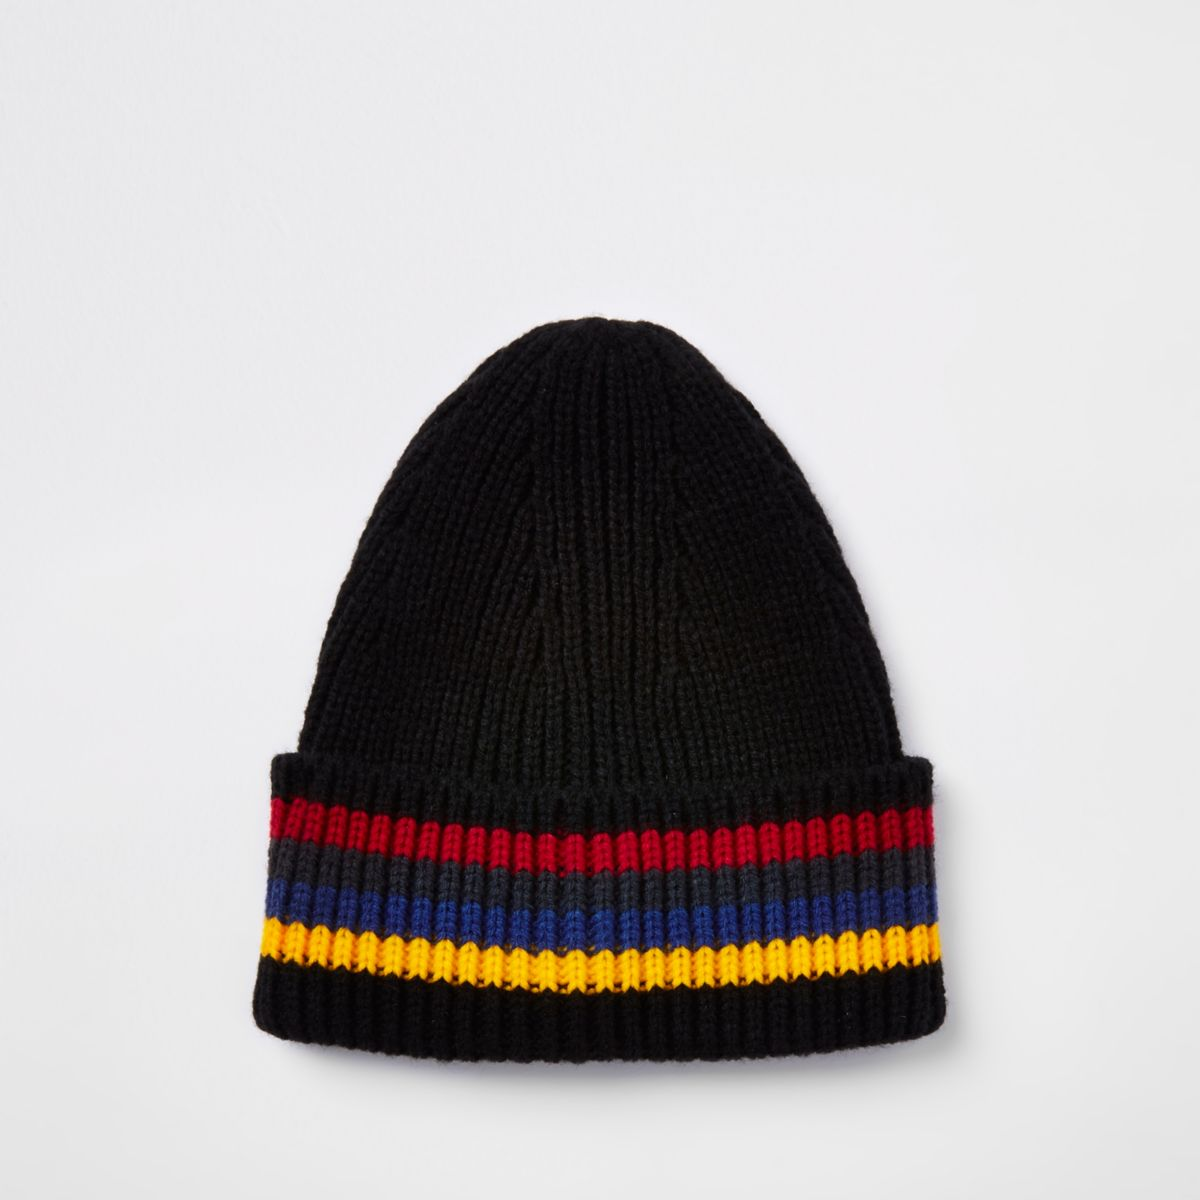 Black stripe fisherman knit beanie hat